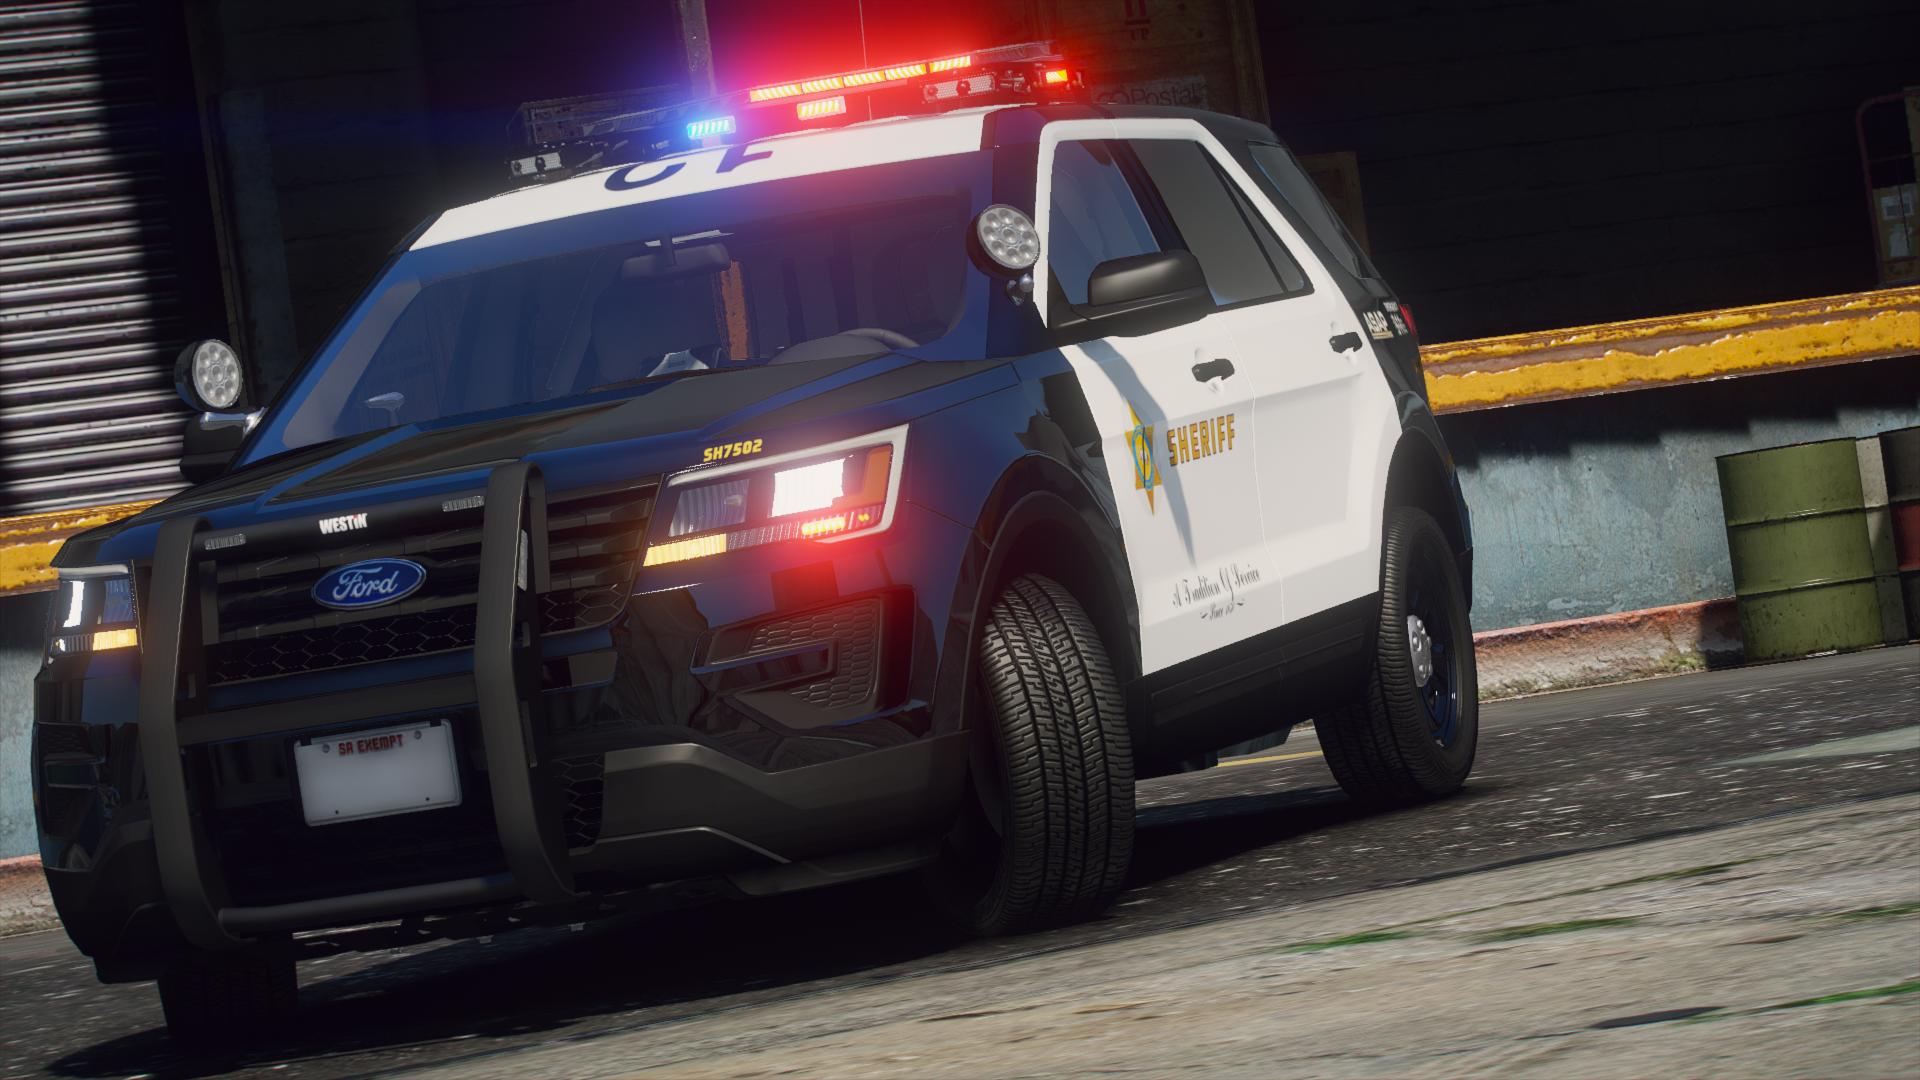 Grand_Theft_Auto_V_Screenshot_2021.06.09_-_16.44.53.88.png